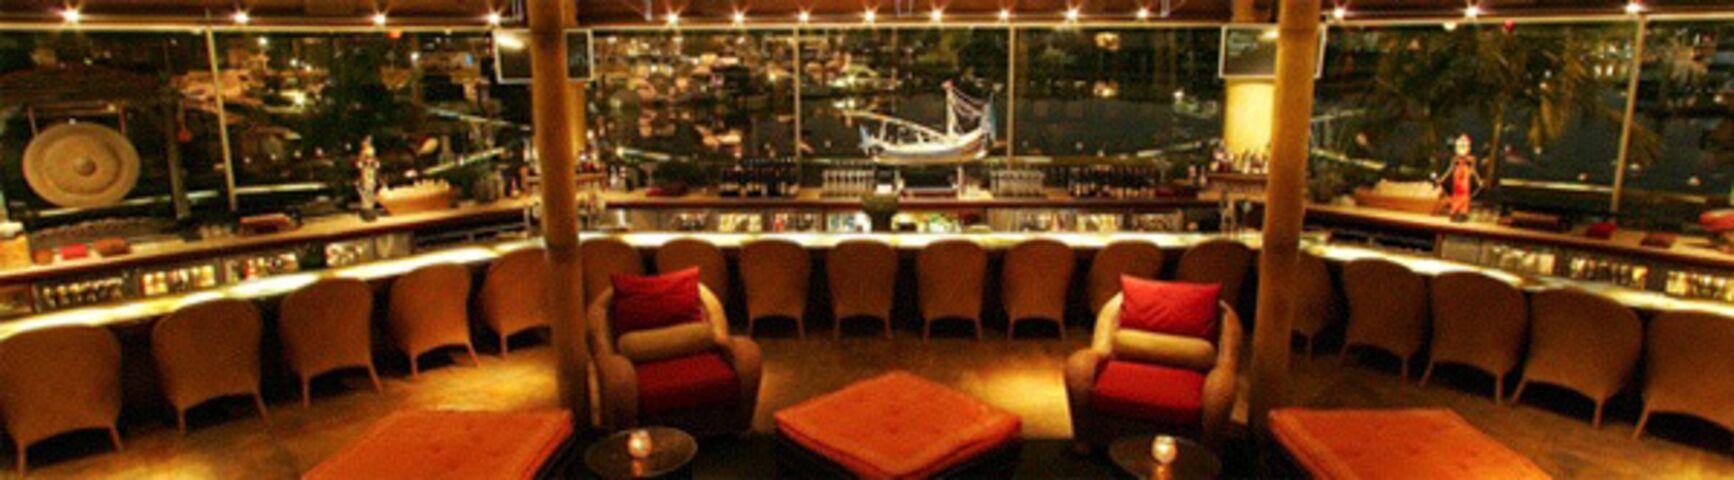 view picture of tantalum restaurant long beach tripadvisor